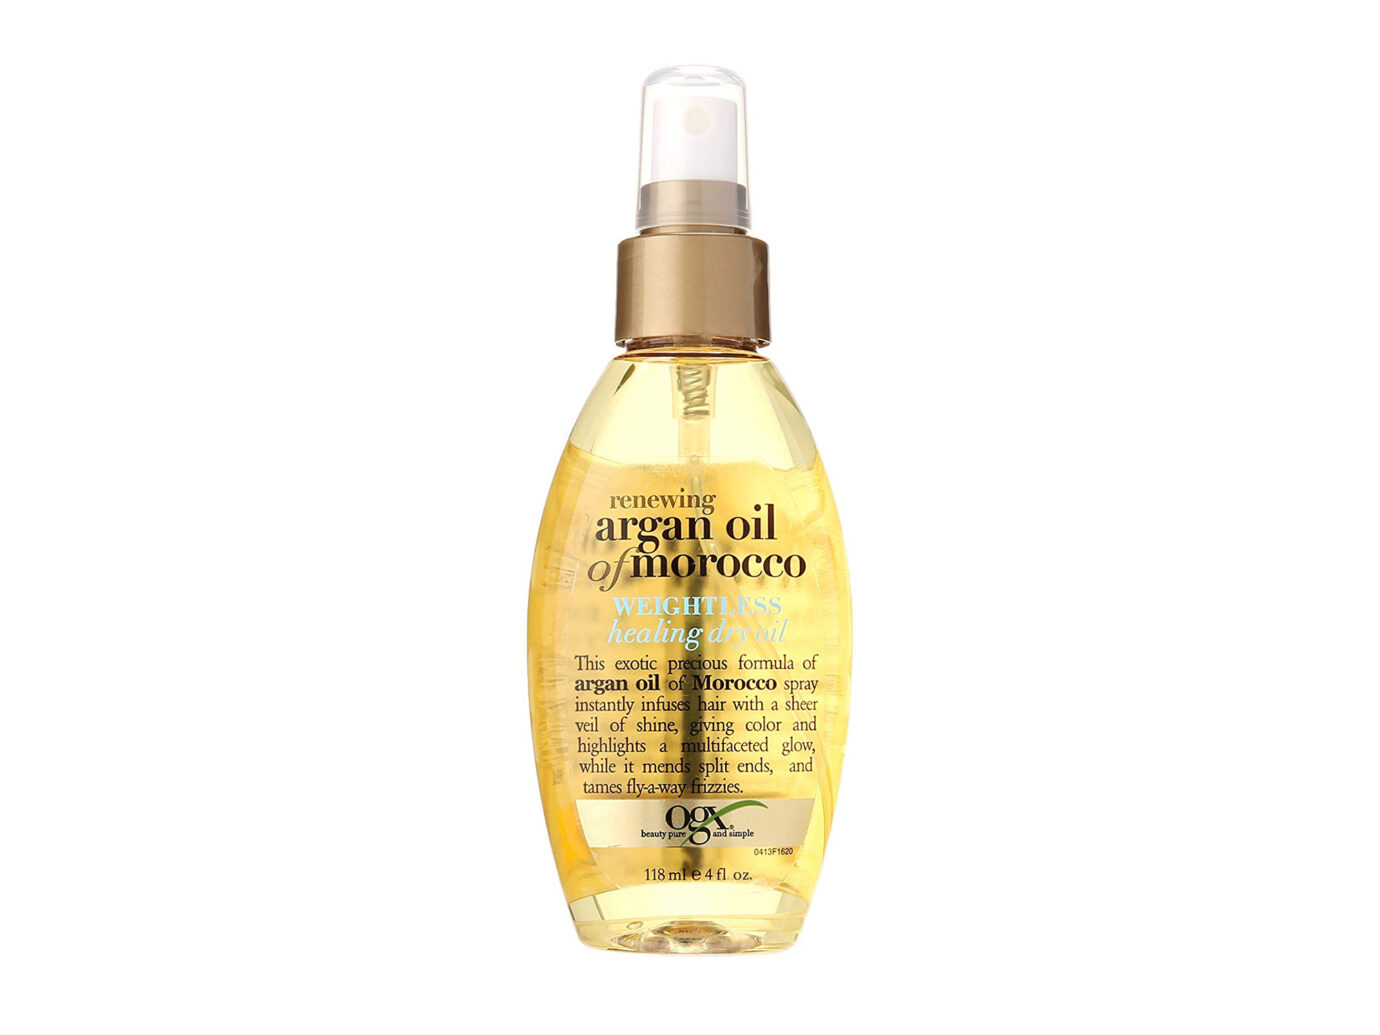 OGX Argan Oil Weightless Healing Dry Oil